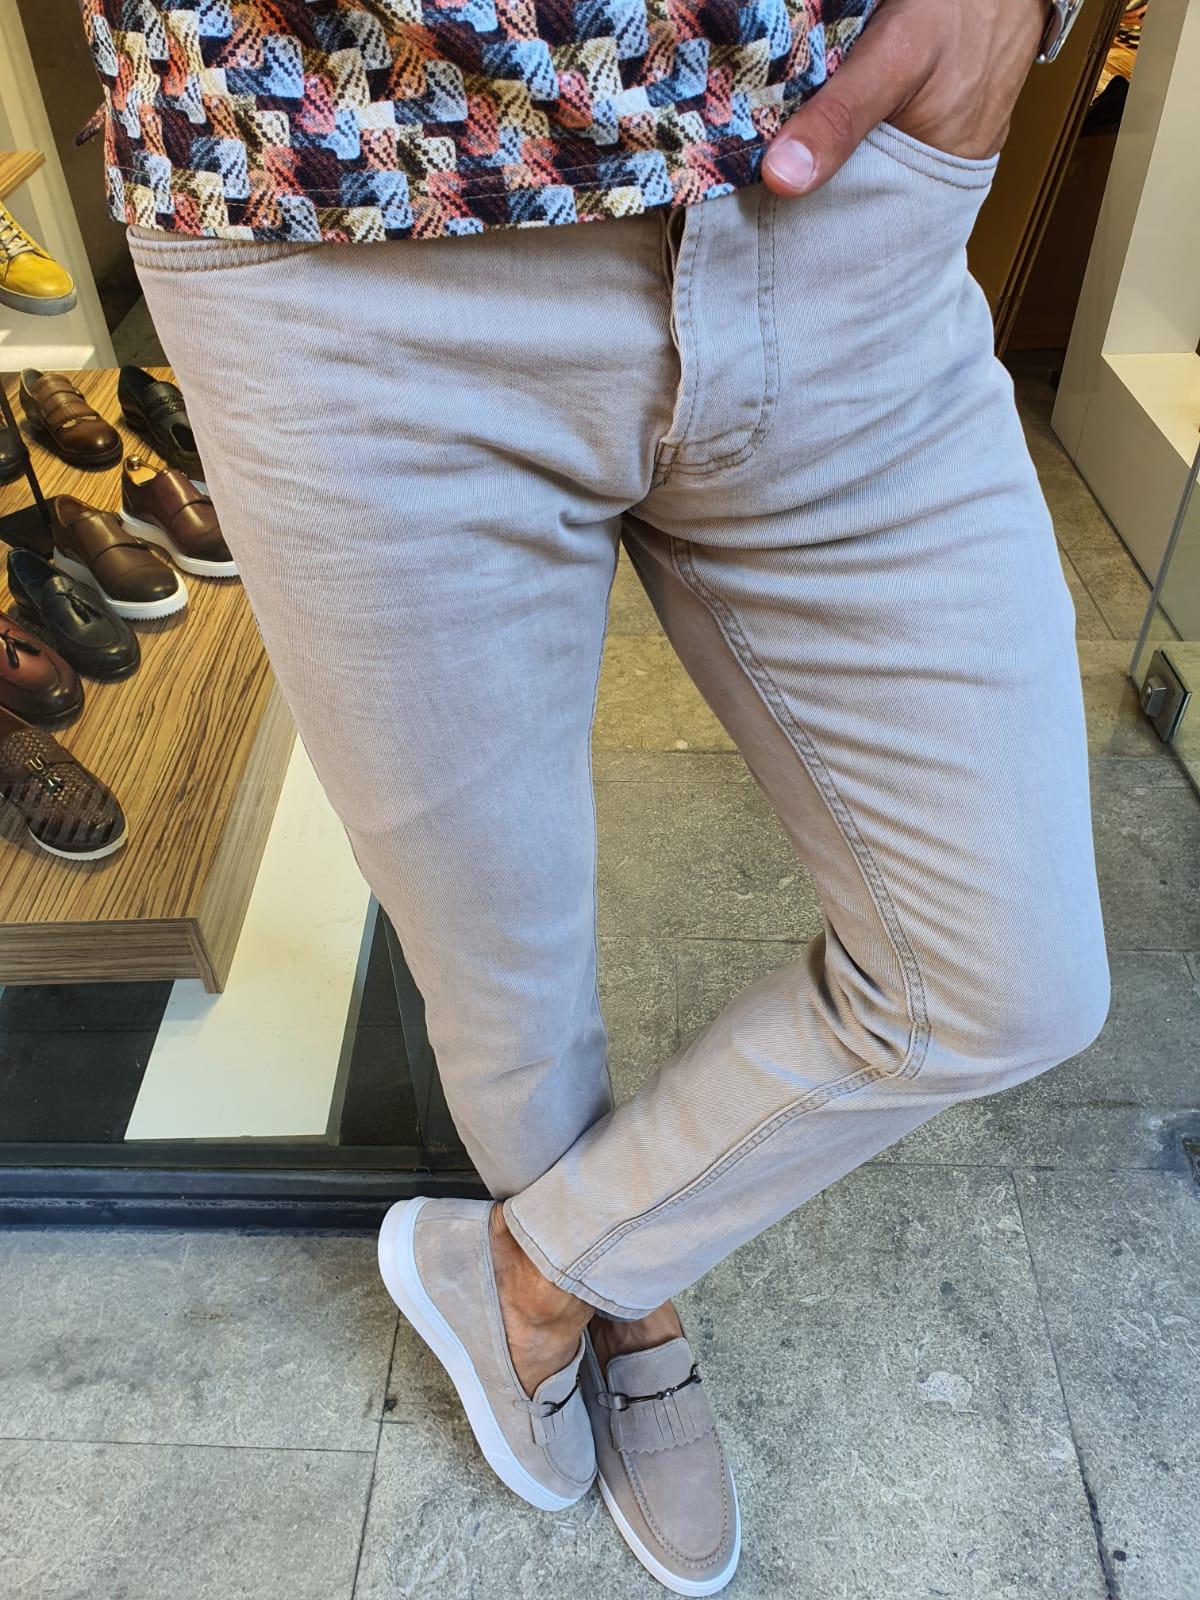 Aysoti Sparks Beige Slim Fit Handmade Jeans